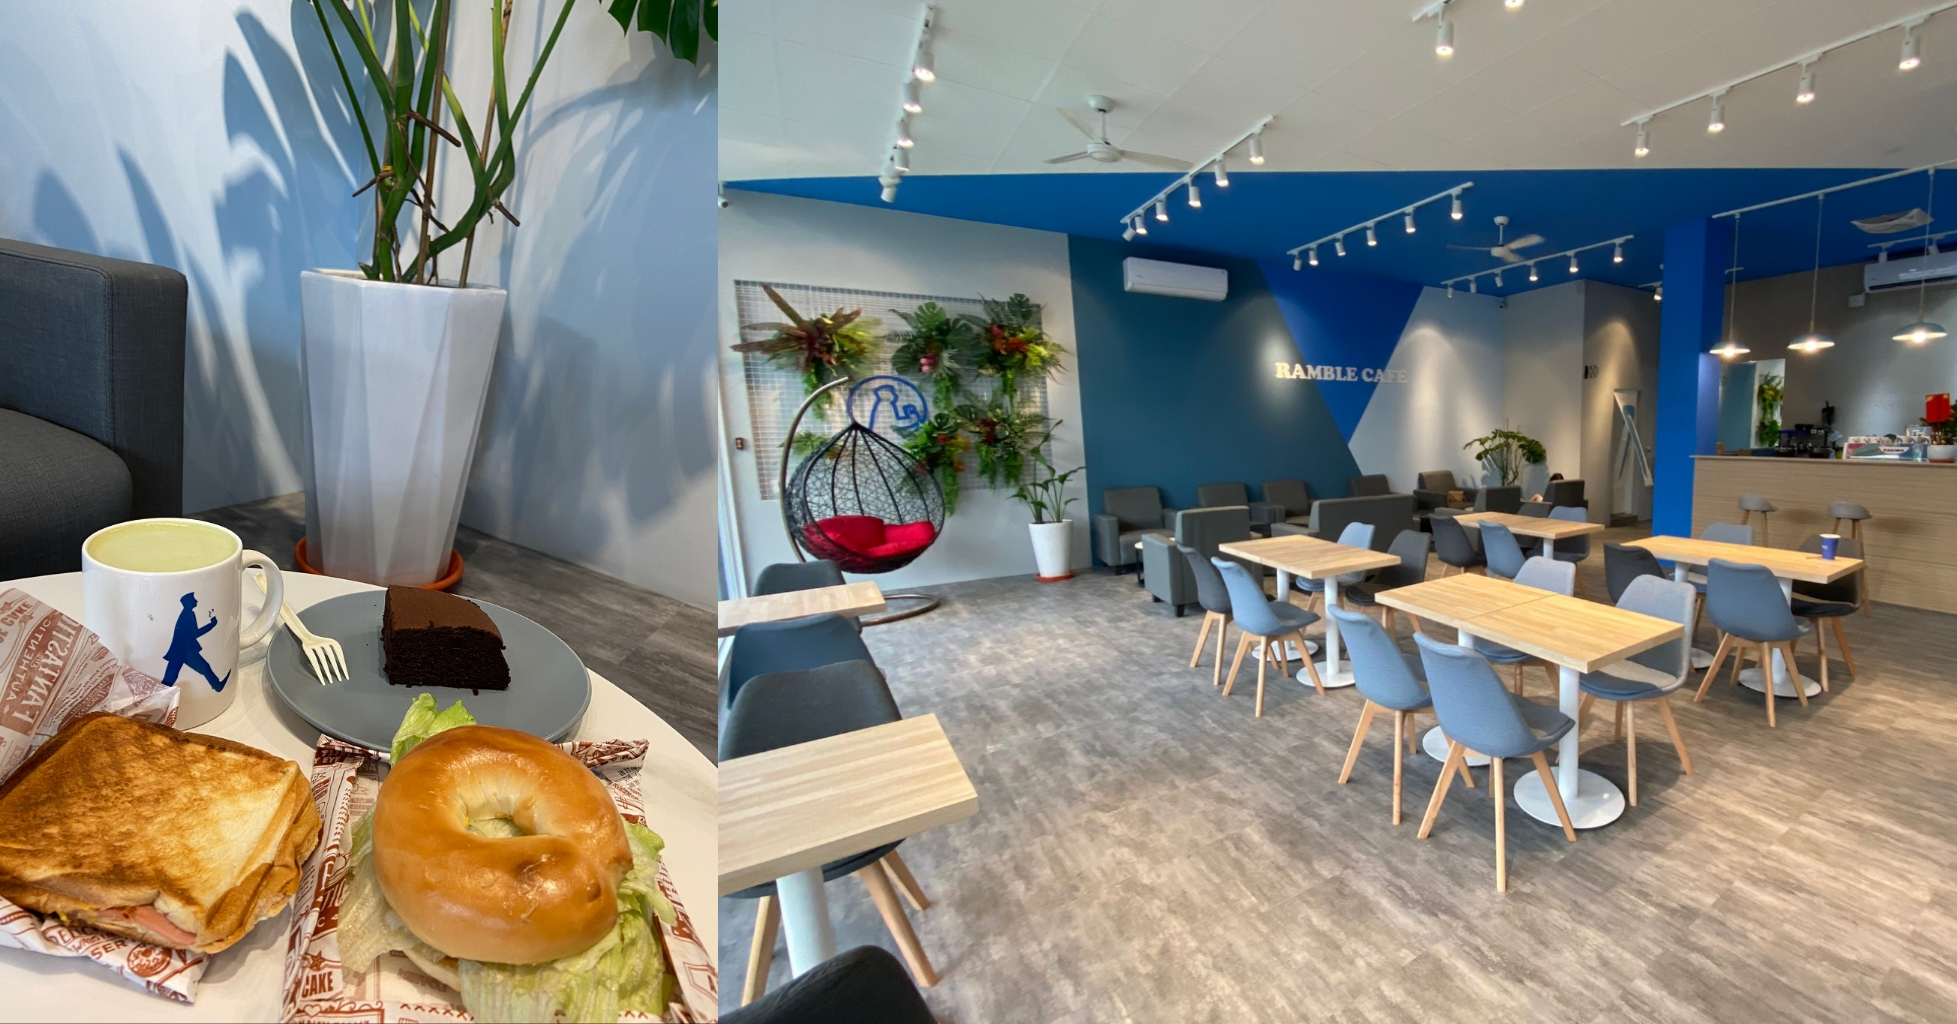 Ramble-cafe 漫步藍咖啡 田中美食 田中咖啡 田中下午茶